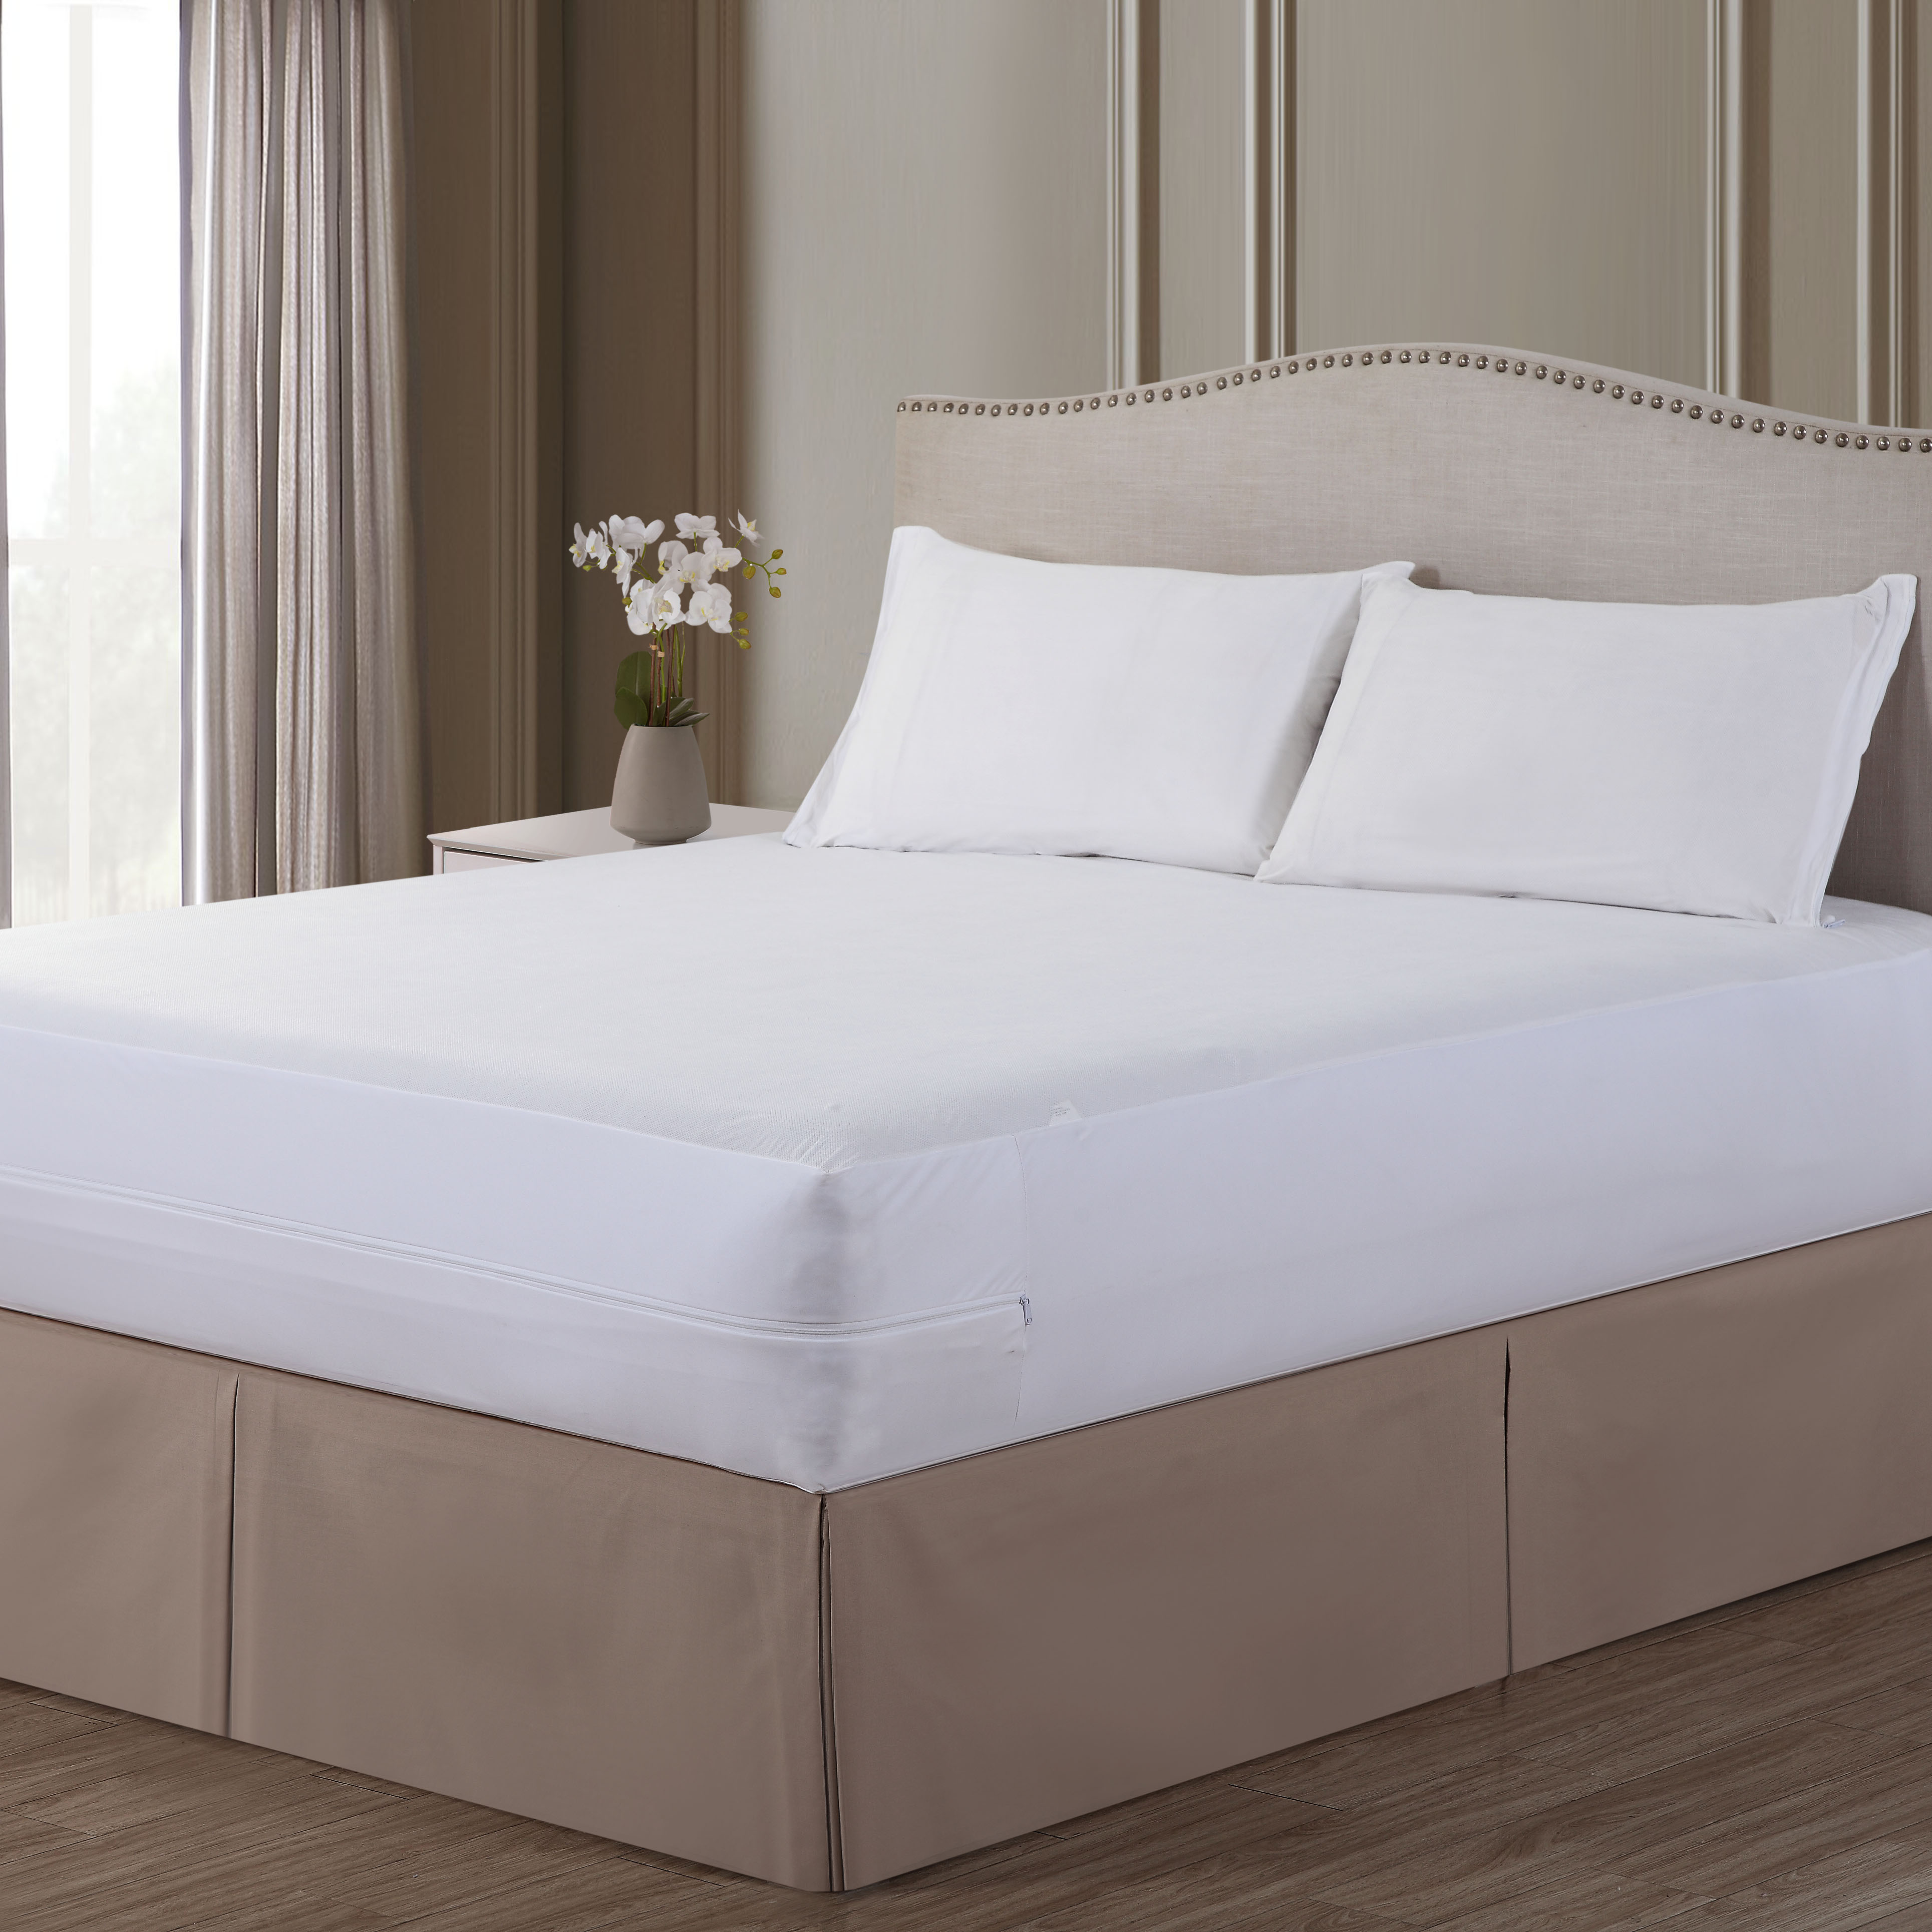 Original Bed Bug Blocker Zippered Mattress Protector - Walmart.com